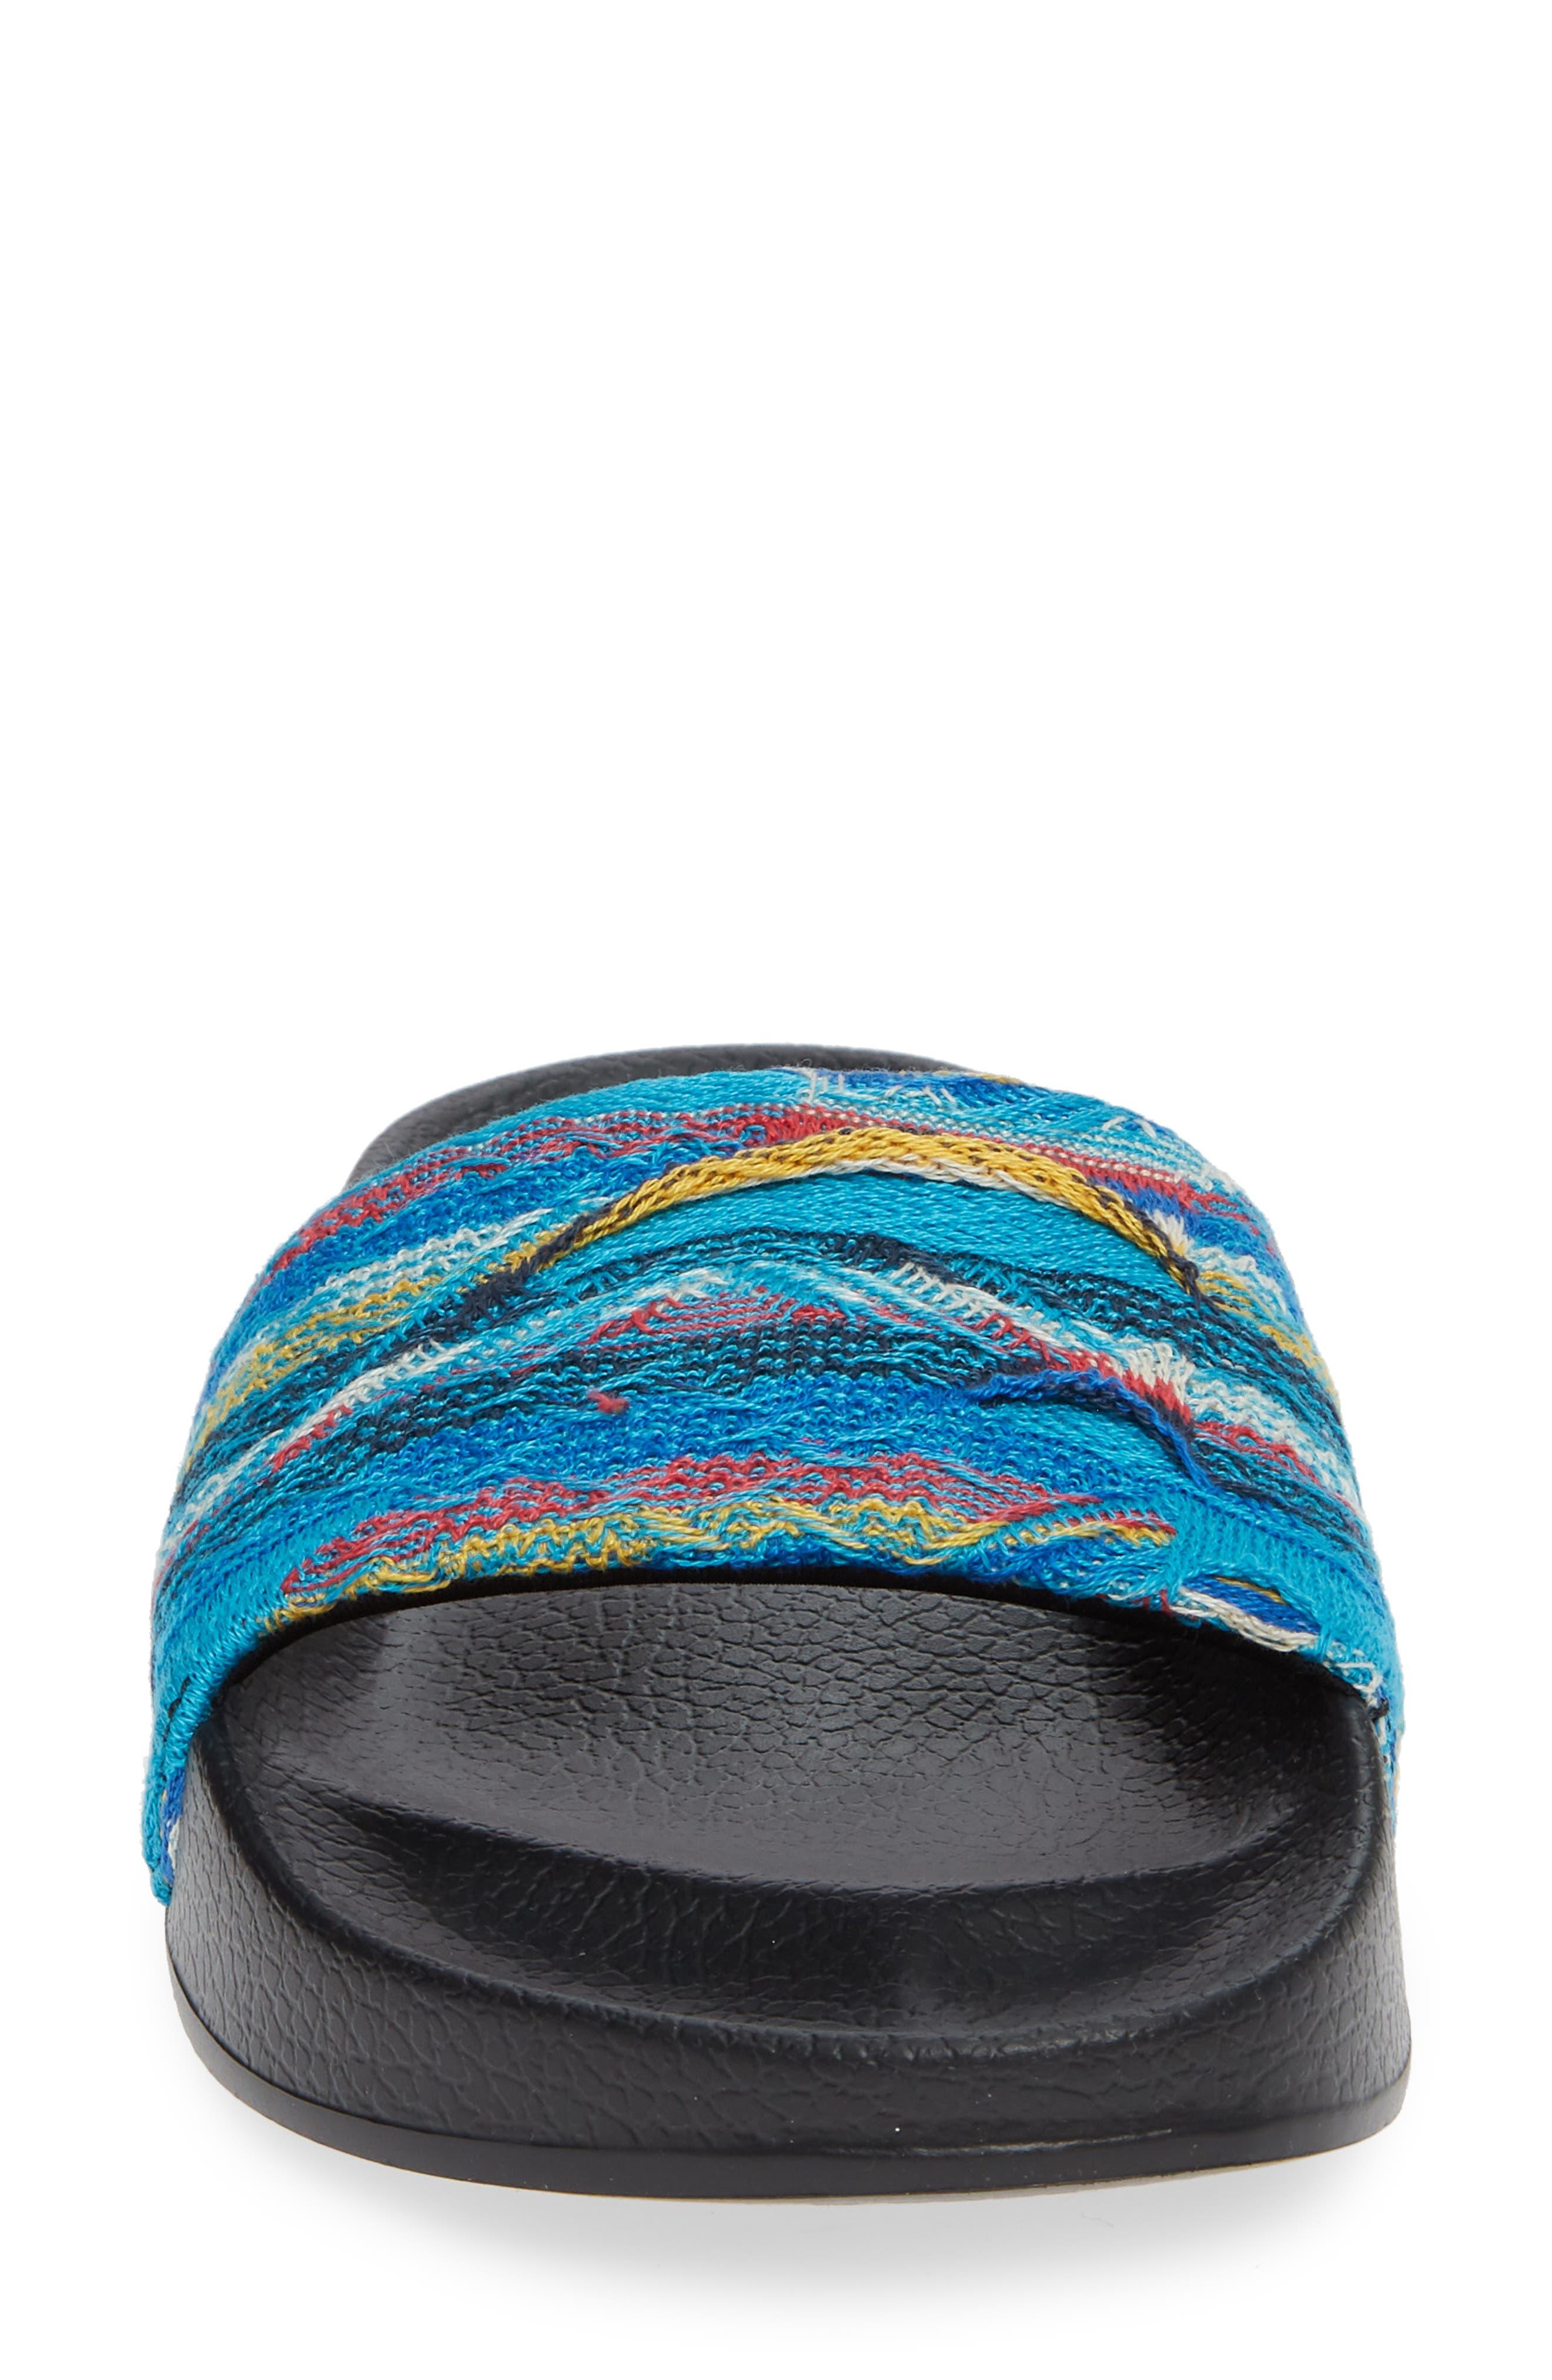 Leadcat Coogie Slide Sandal,                             Alternate thumbnail 4, color,                             ISLAND PARADISE/ PUMA BLACK